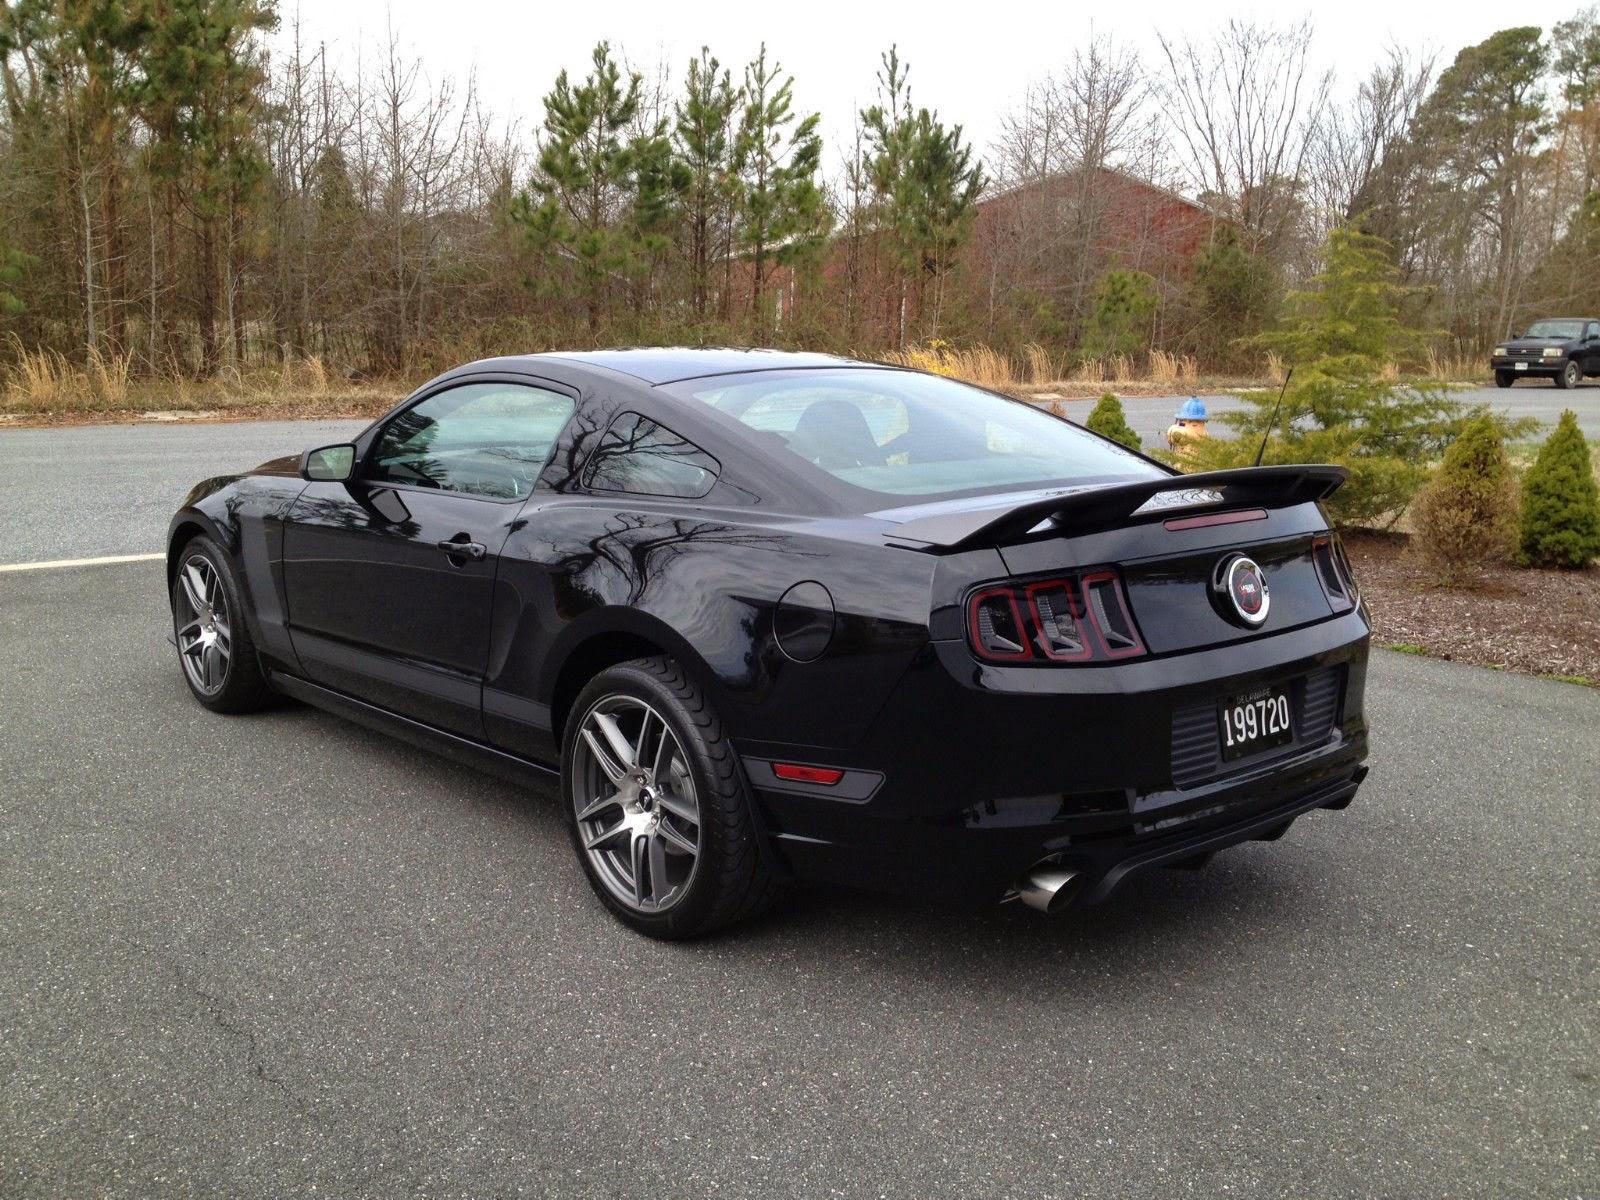 2013 Mustang Laguna Seca For Sale.html   Autos Weblog